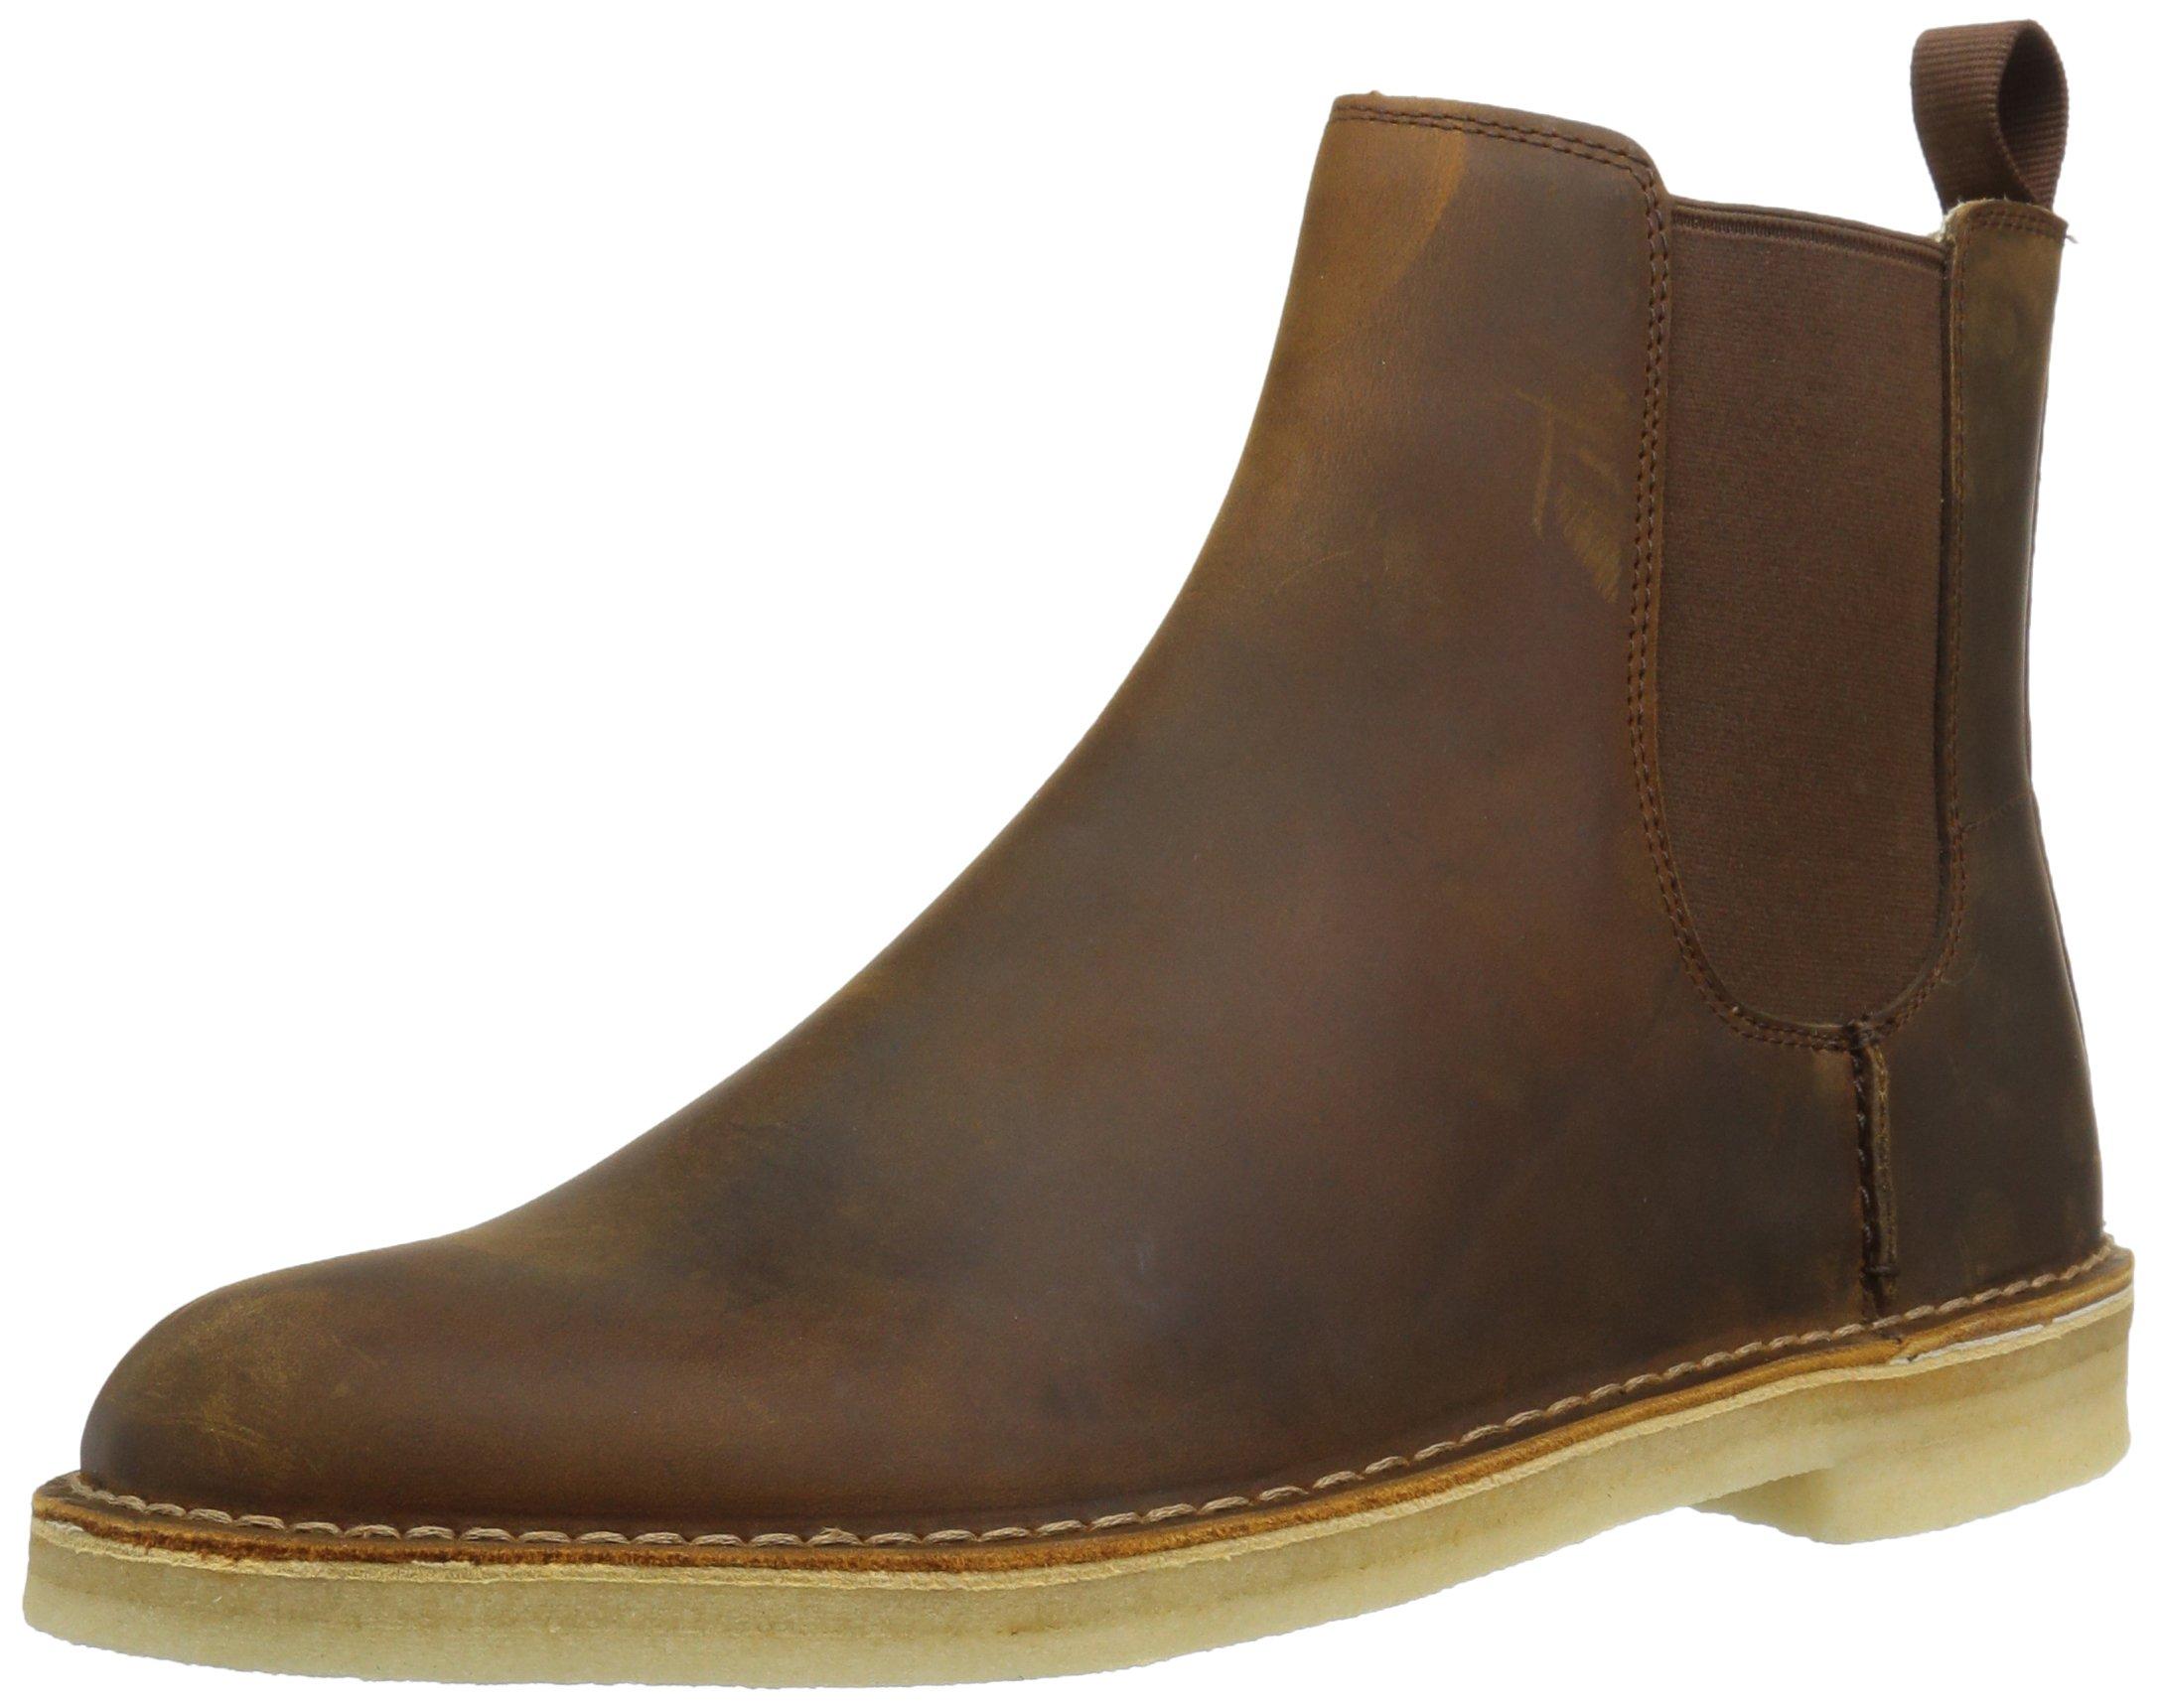 CLARKS Men's Desert Peak Chelsea Boot, Beeswax Leather, 11 Medium US